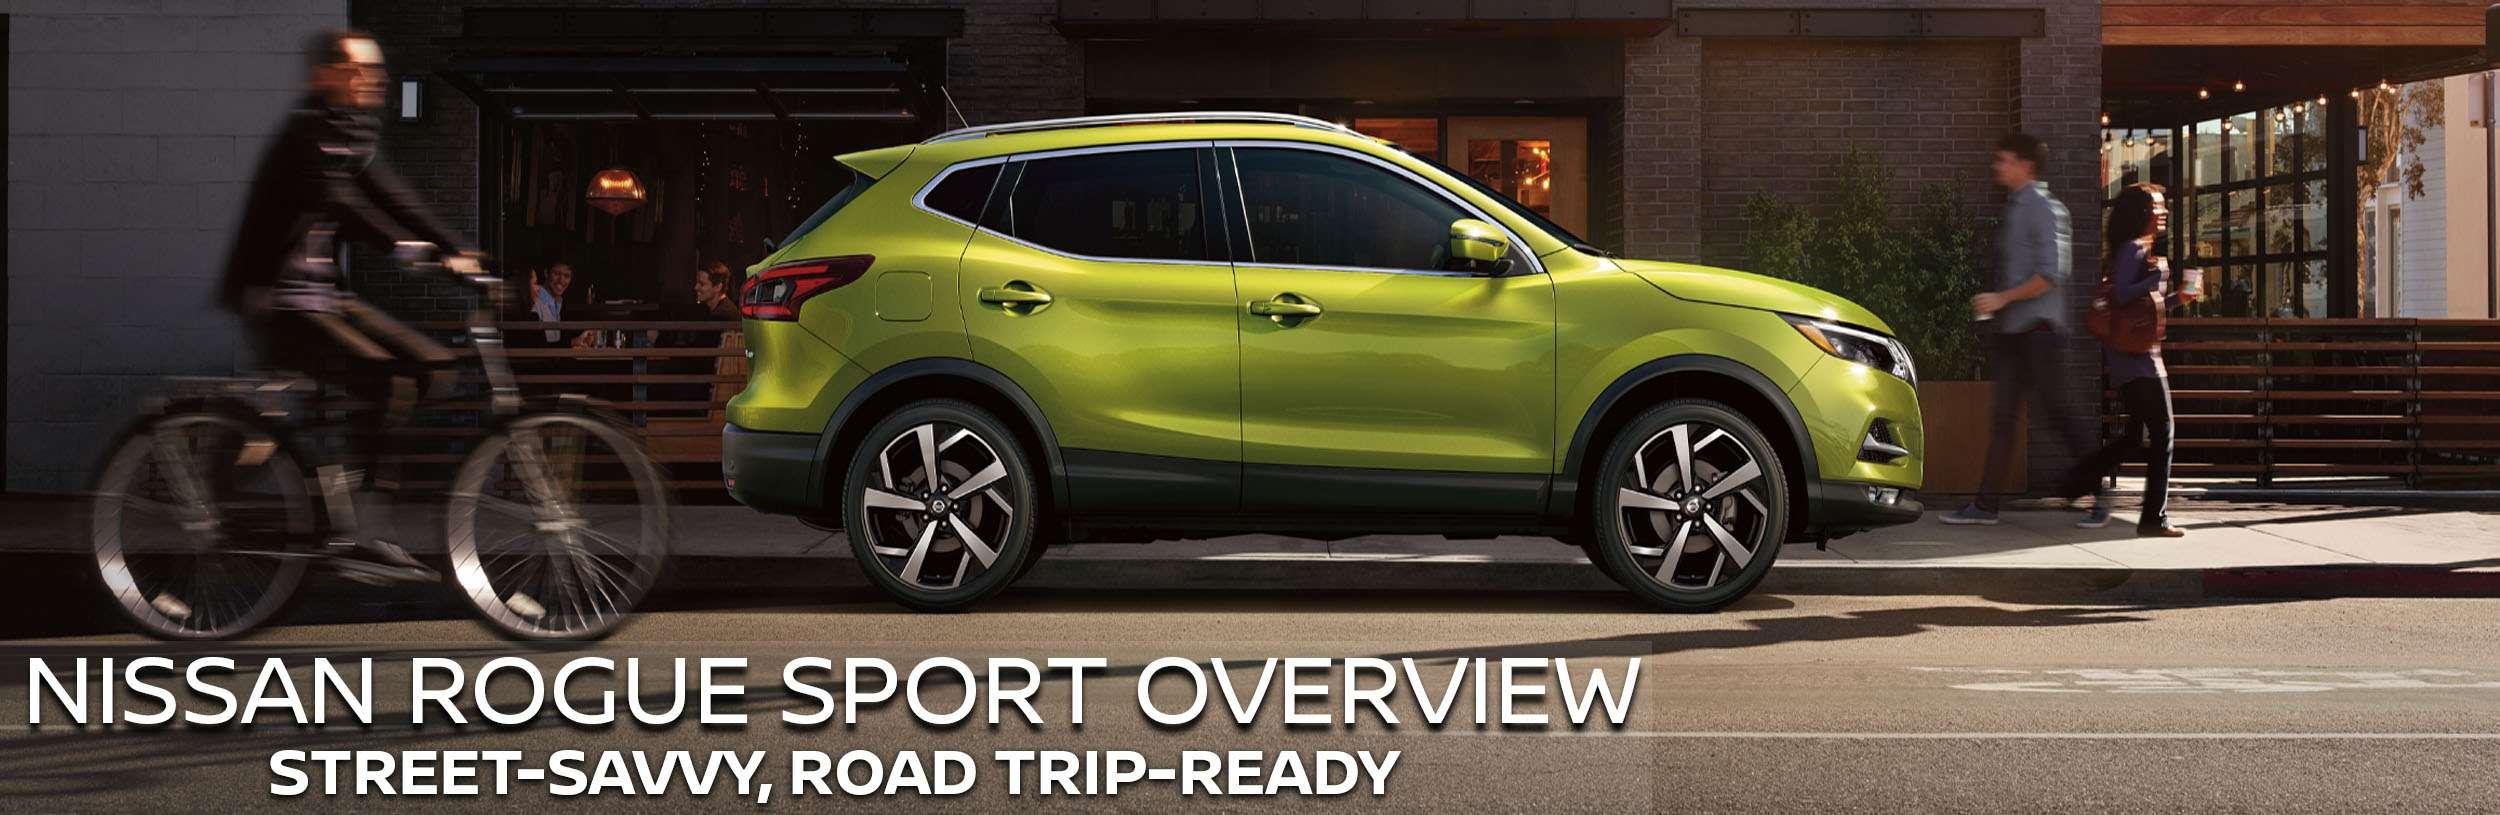 2020 Nissan Rogue Sport Specs Review Price Trim Photos Changes